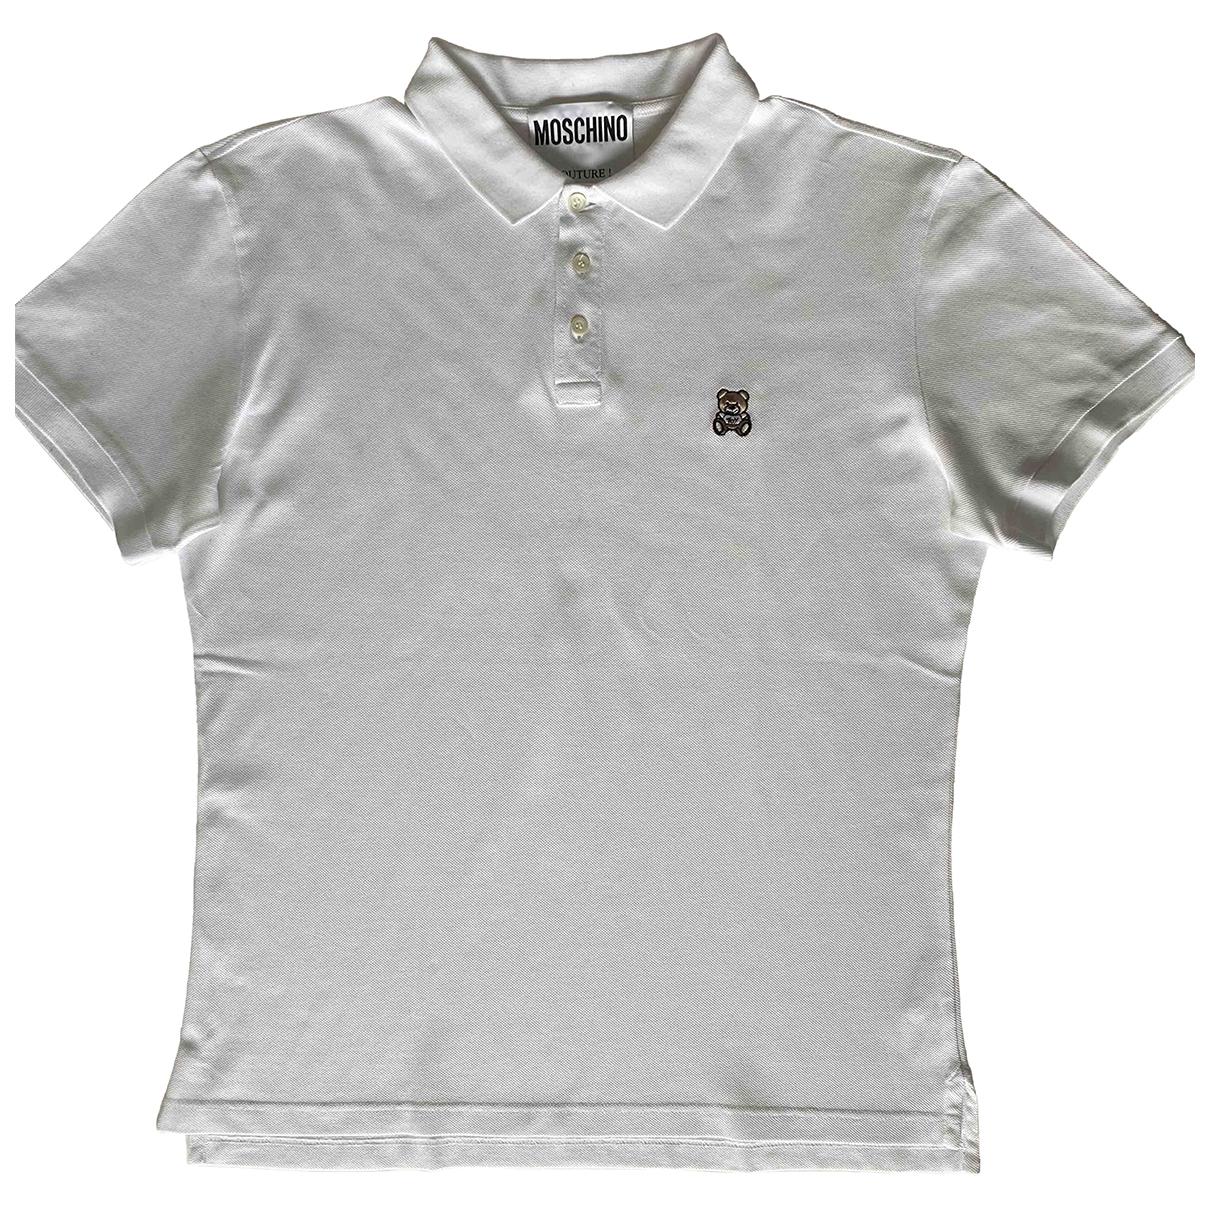 Moschino \N Poloshirts in  Weiss Baumwolle